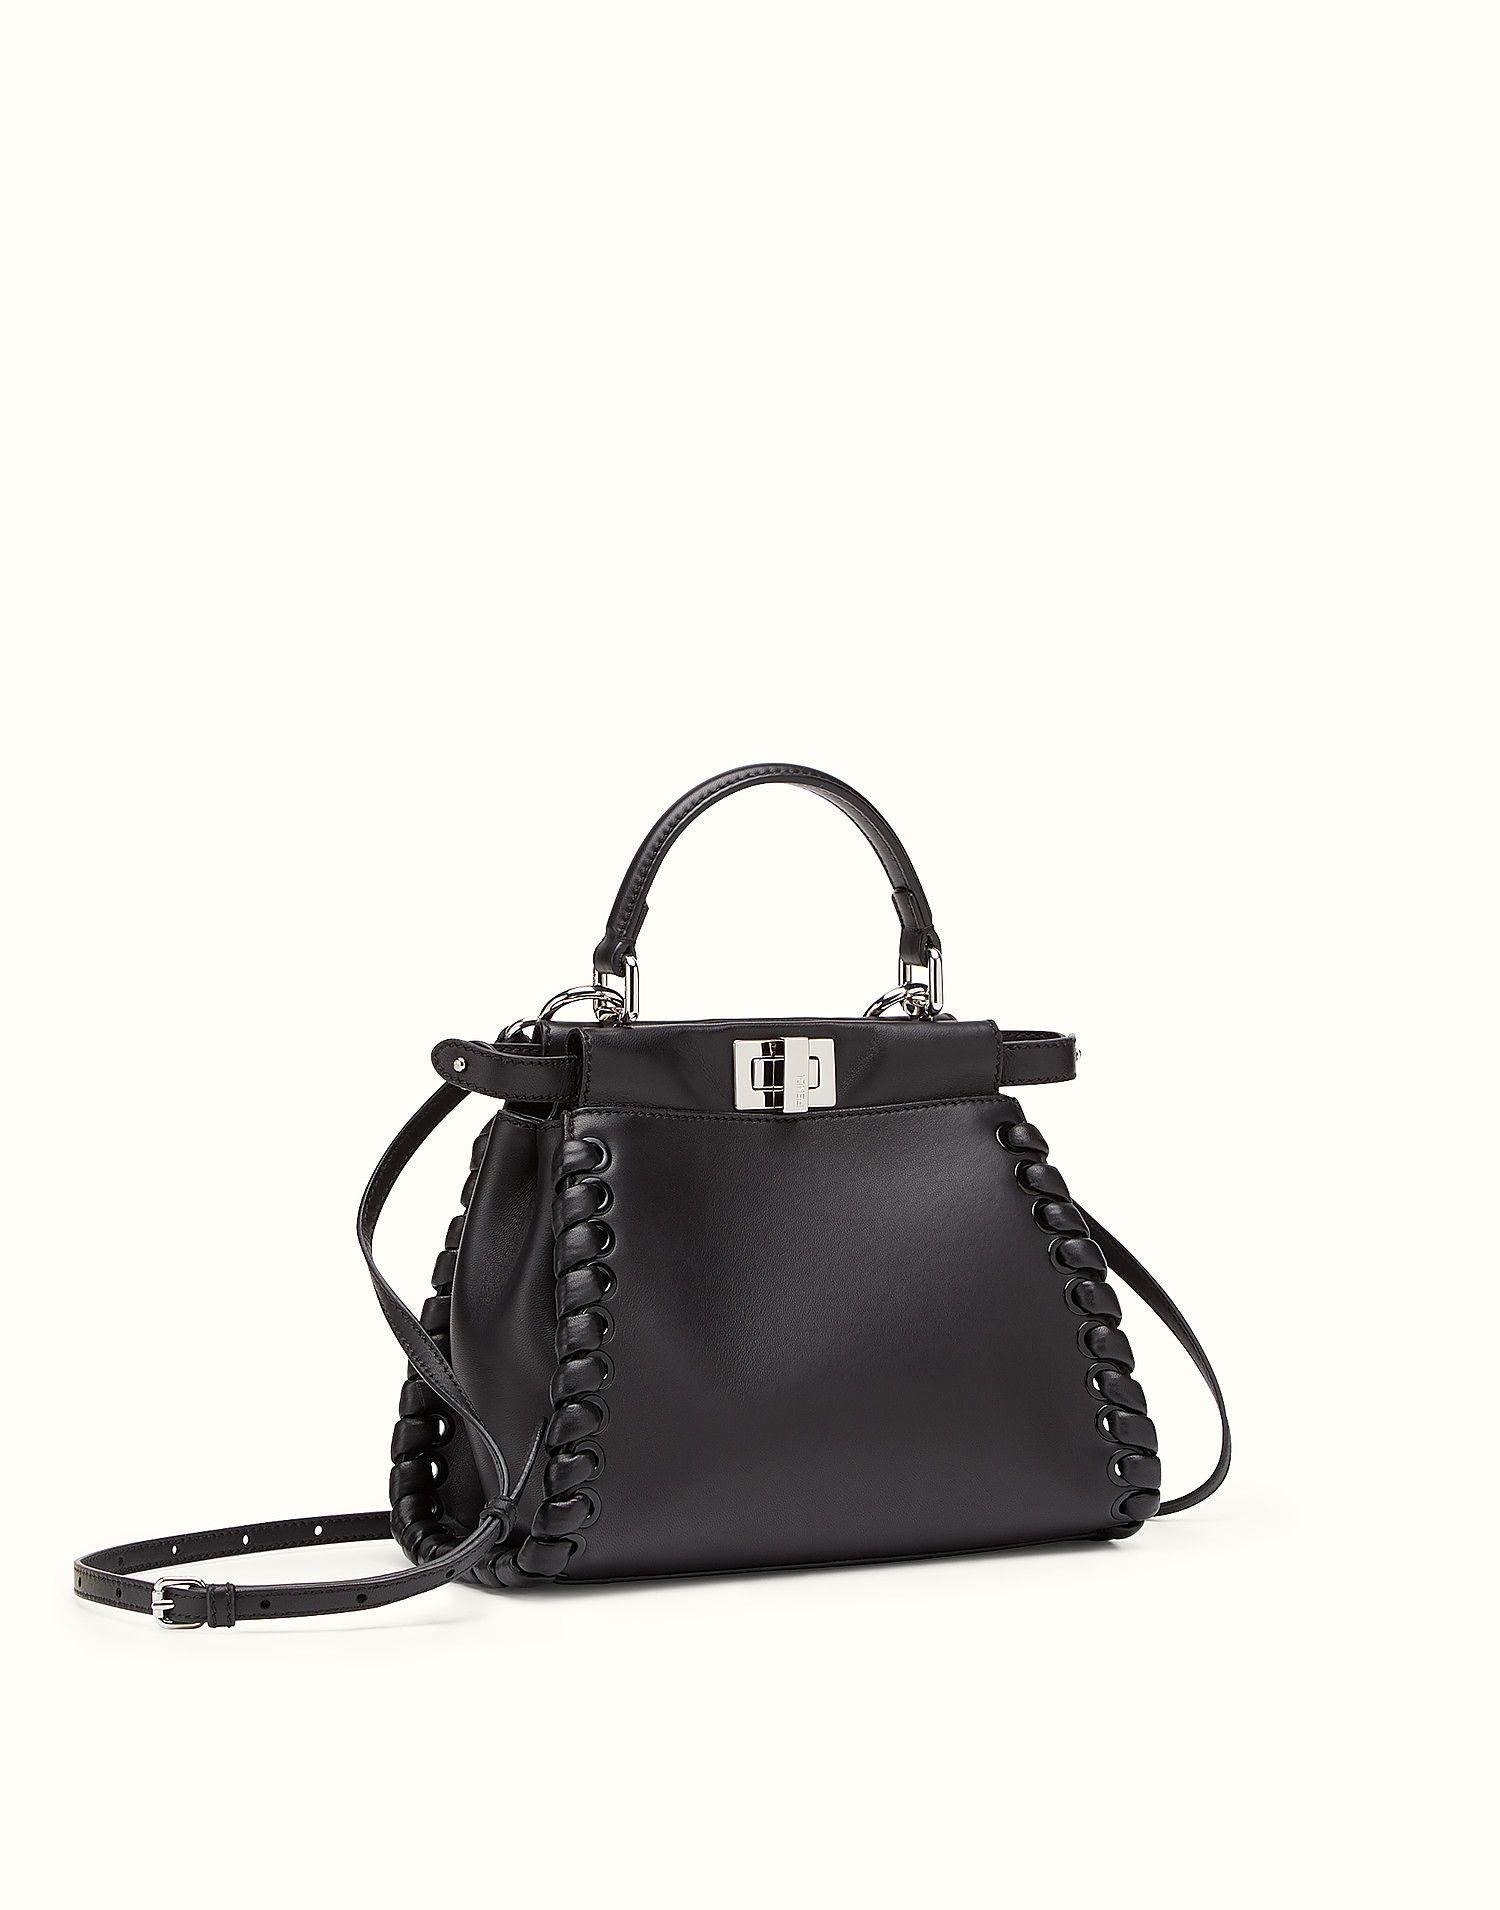 Peekaboo mini in 2019   Purses I Like   Pinterest   Handbags, Fendi ... fd445203b4